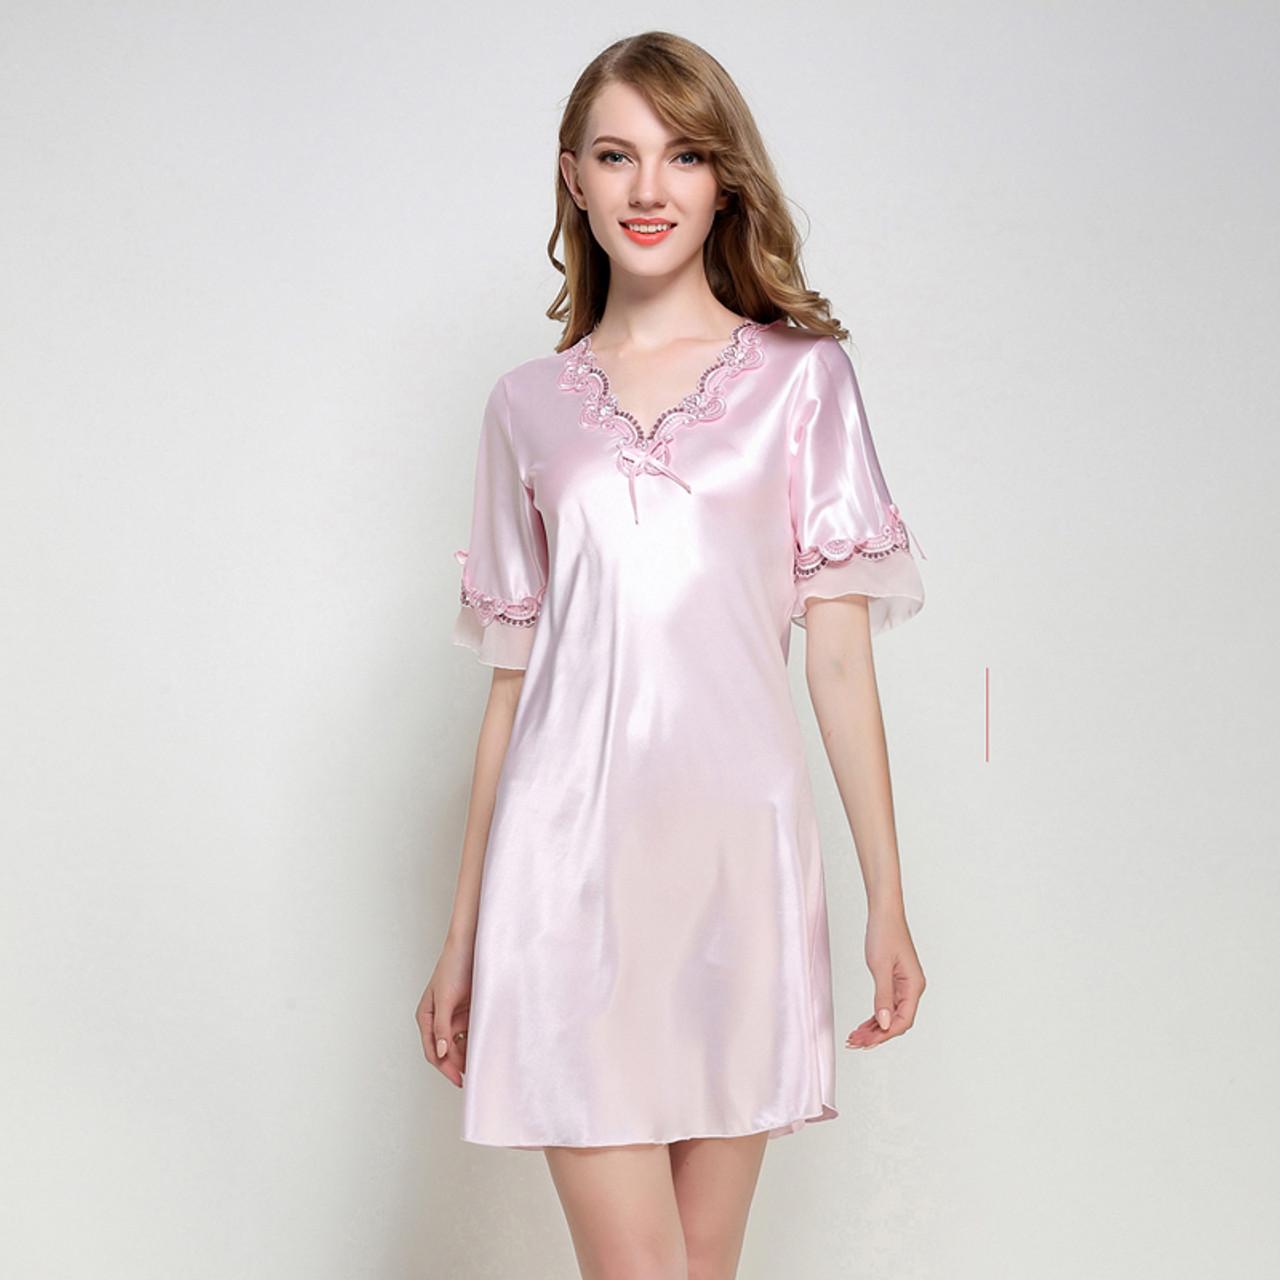 647af0be2e ... Women Silk Satin Nightgown Short Sleeve Sleepshirt V-neck Night Shirt  Elegant Night Dress Lace